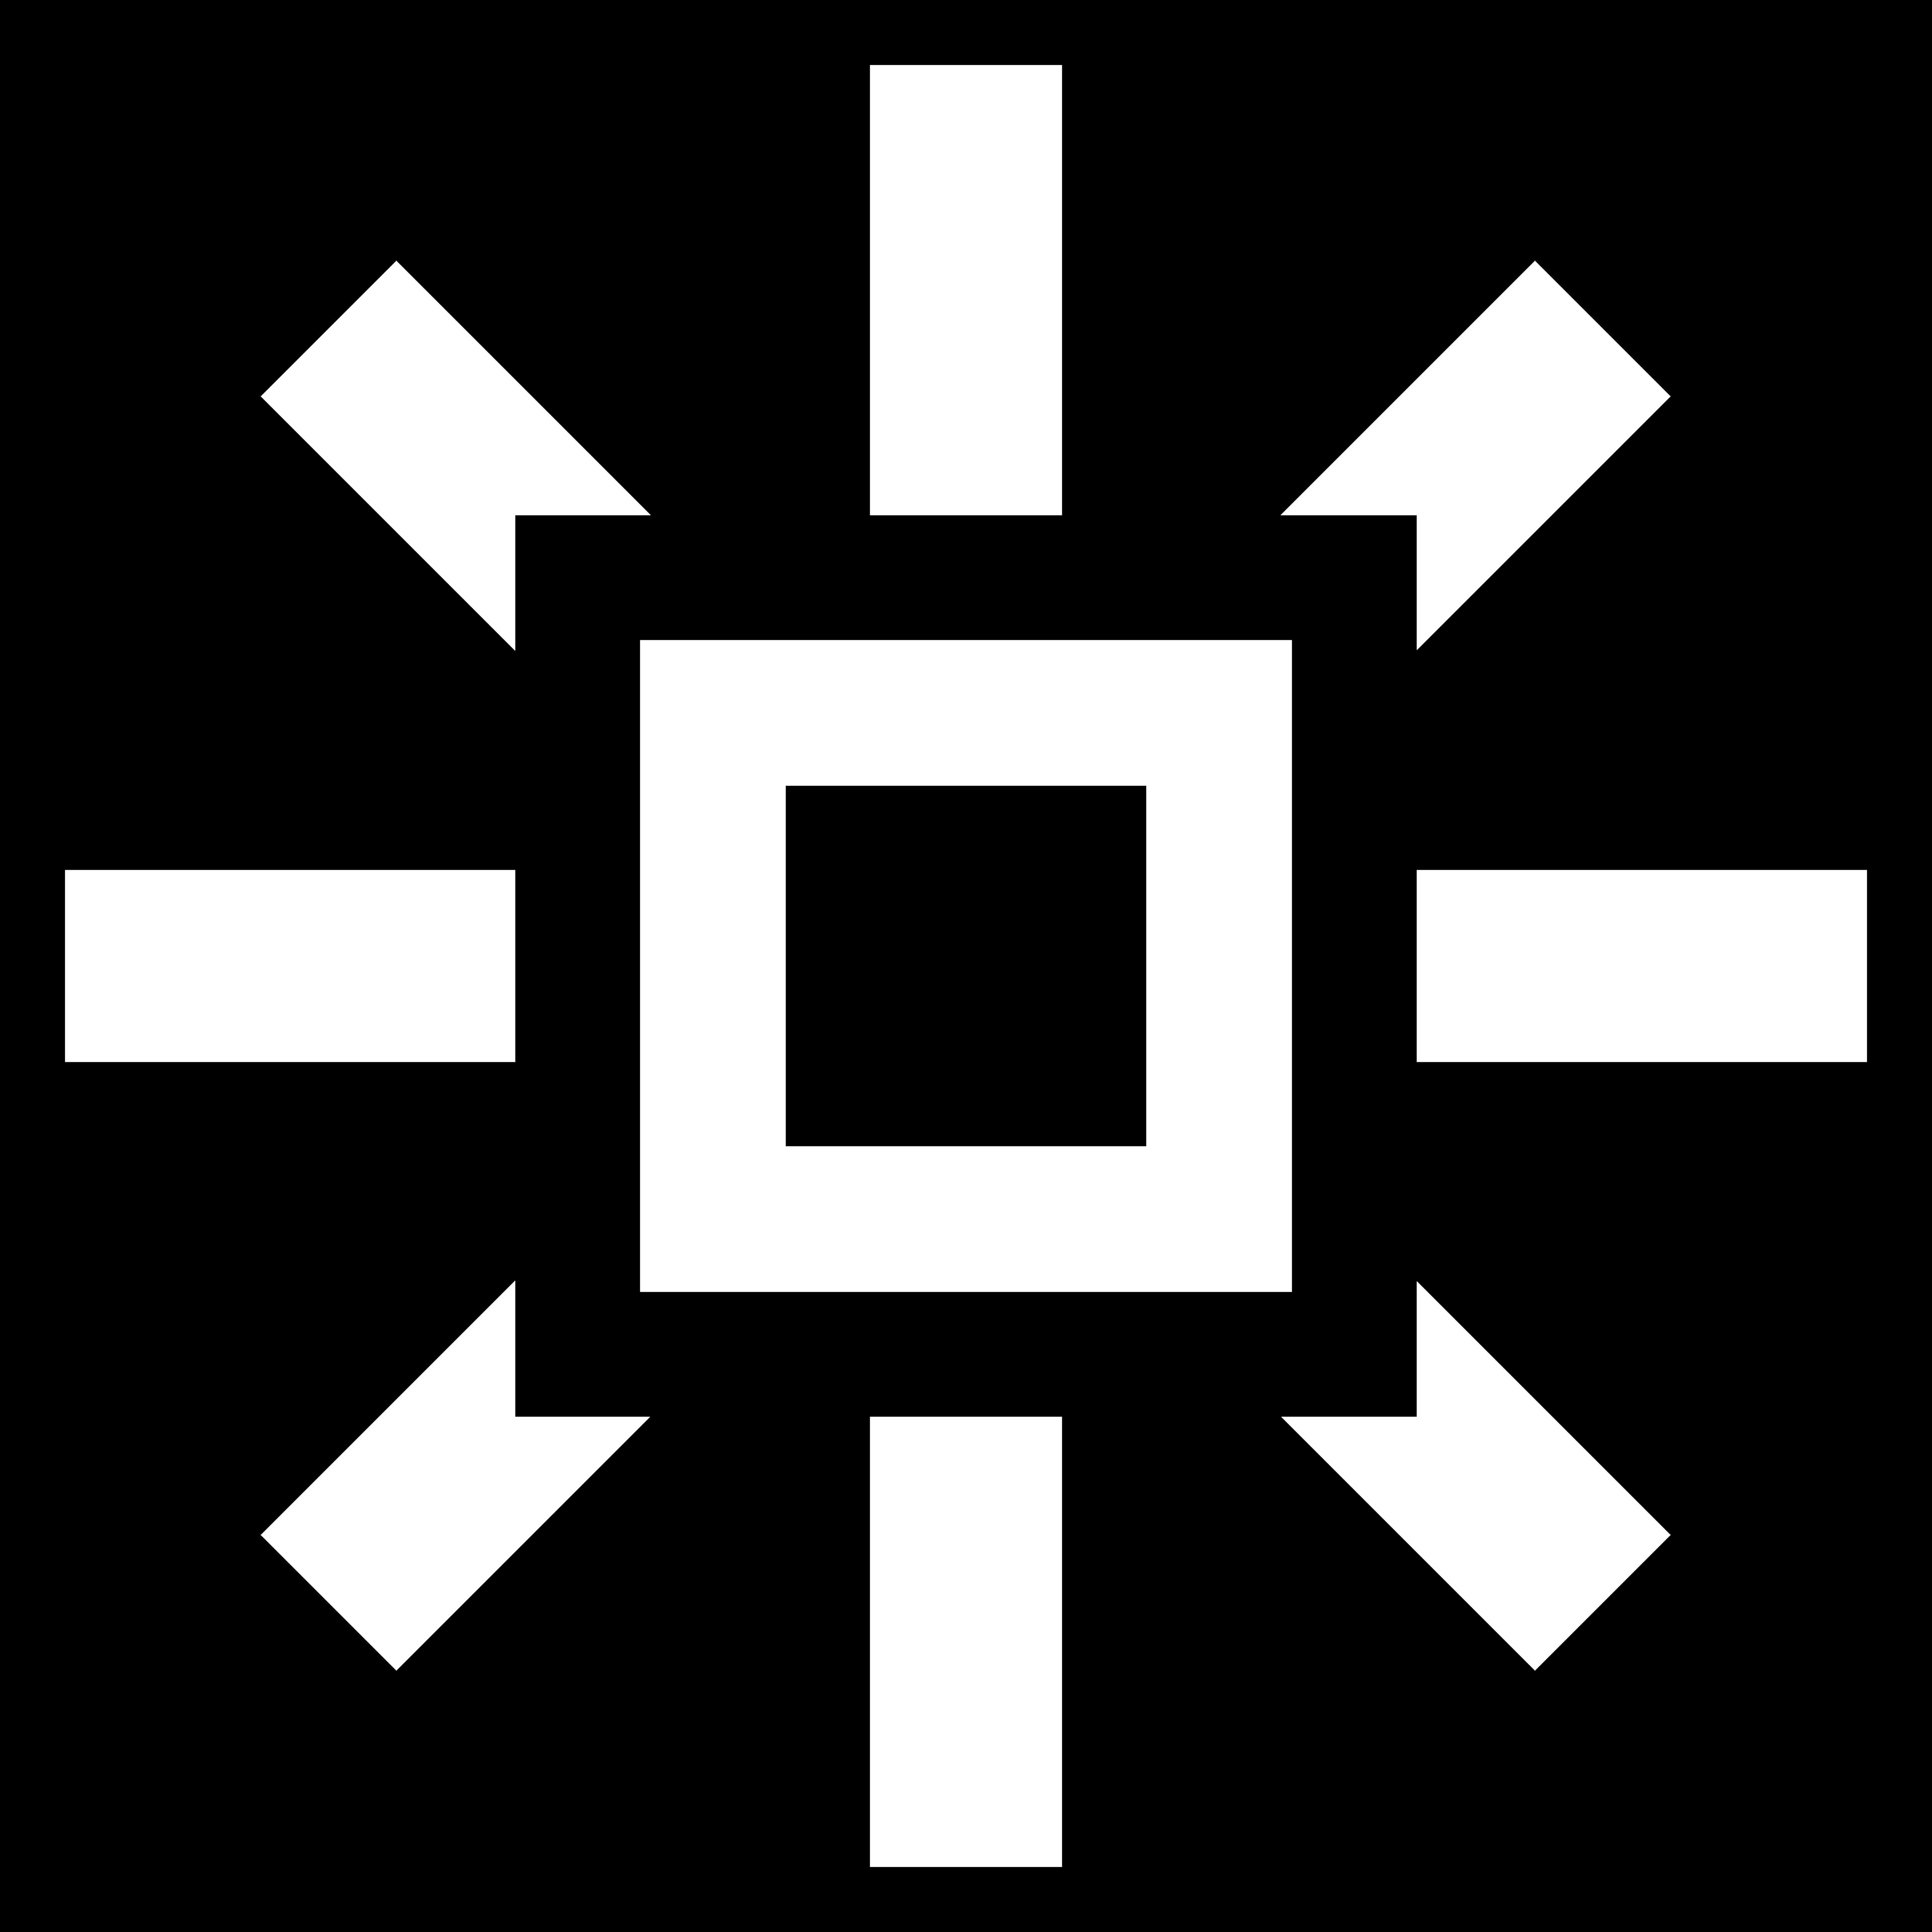 Plik:Ezic ending logo.png